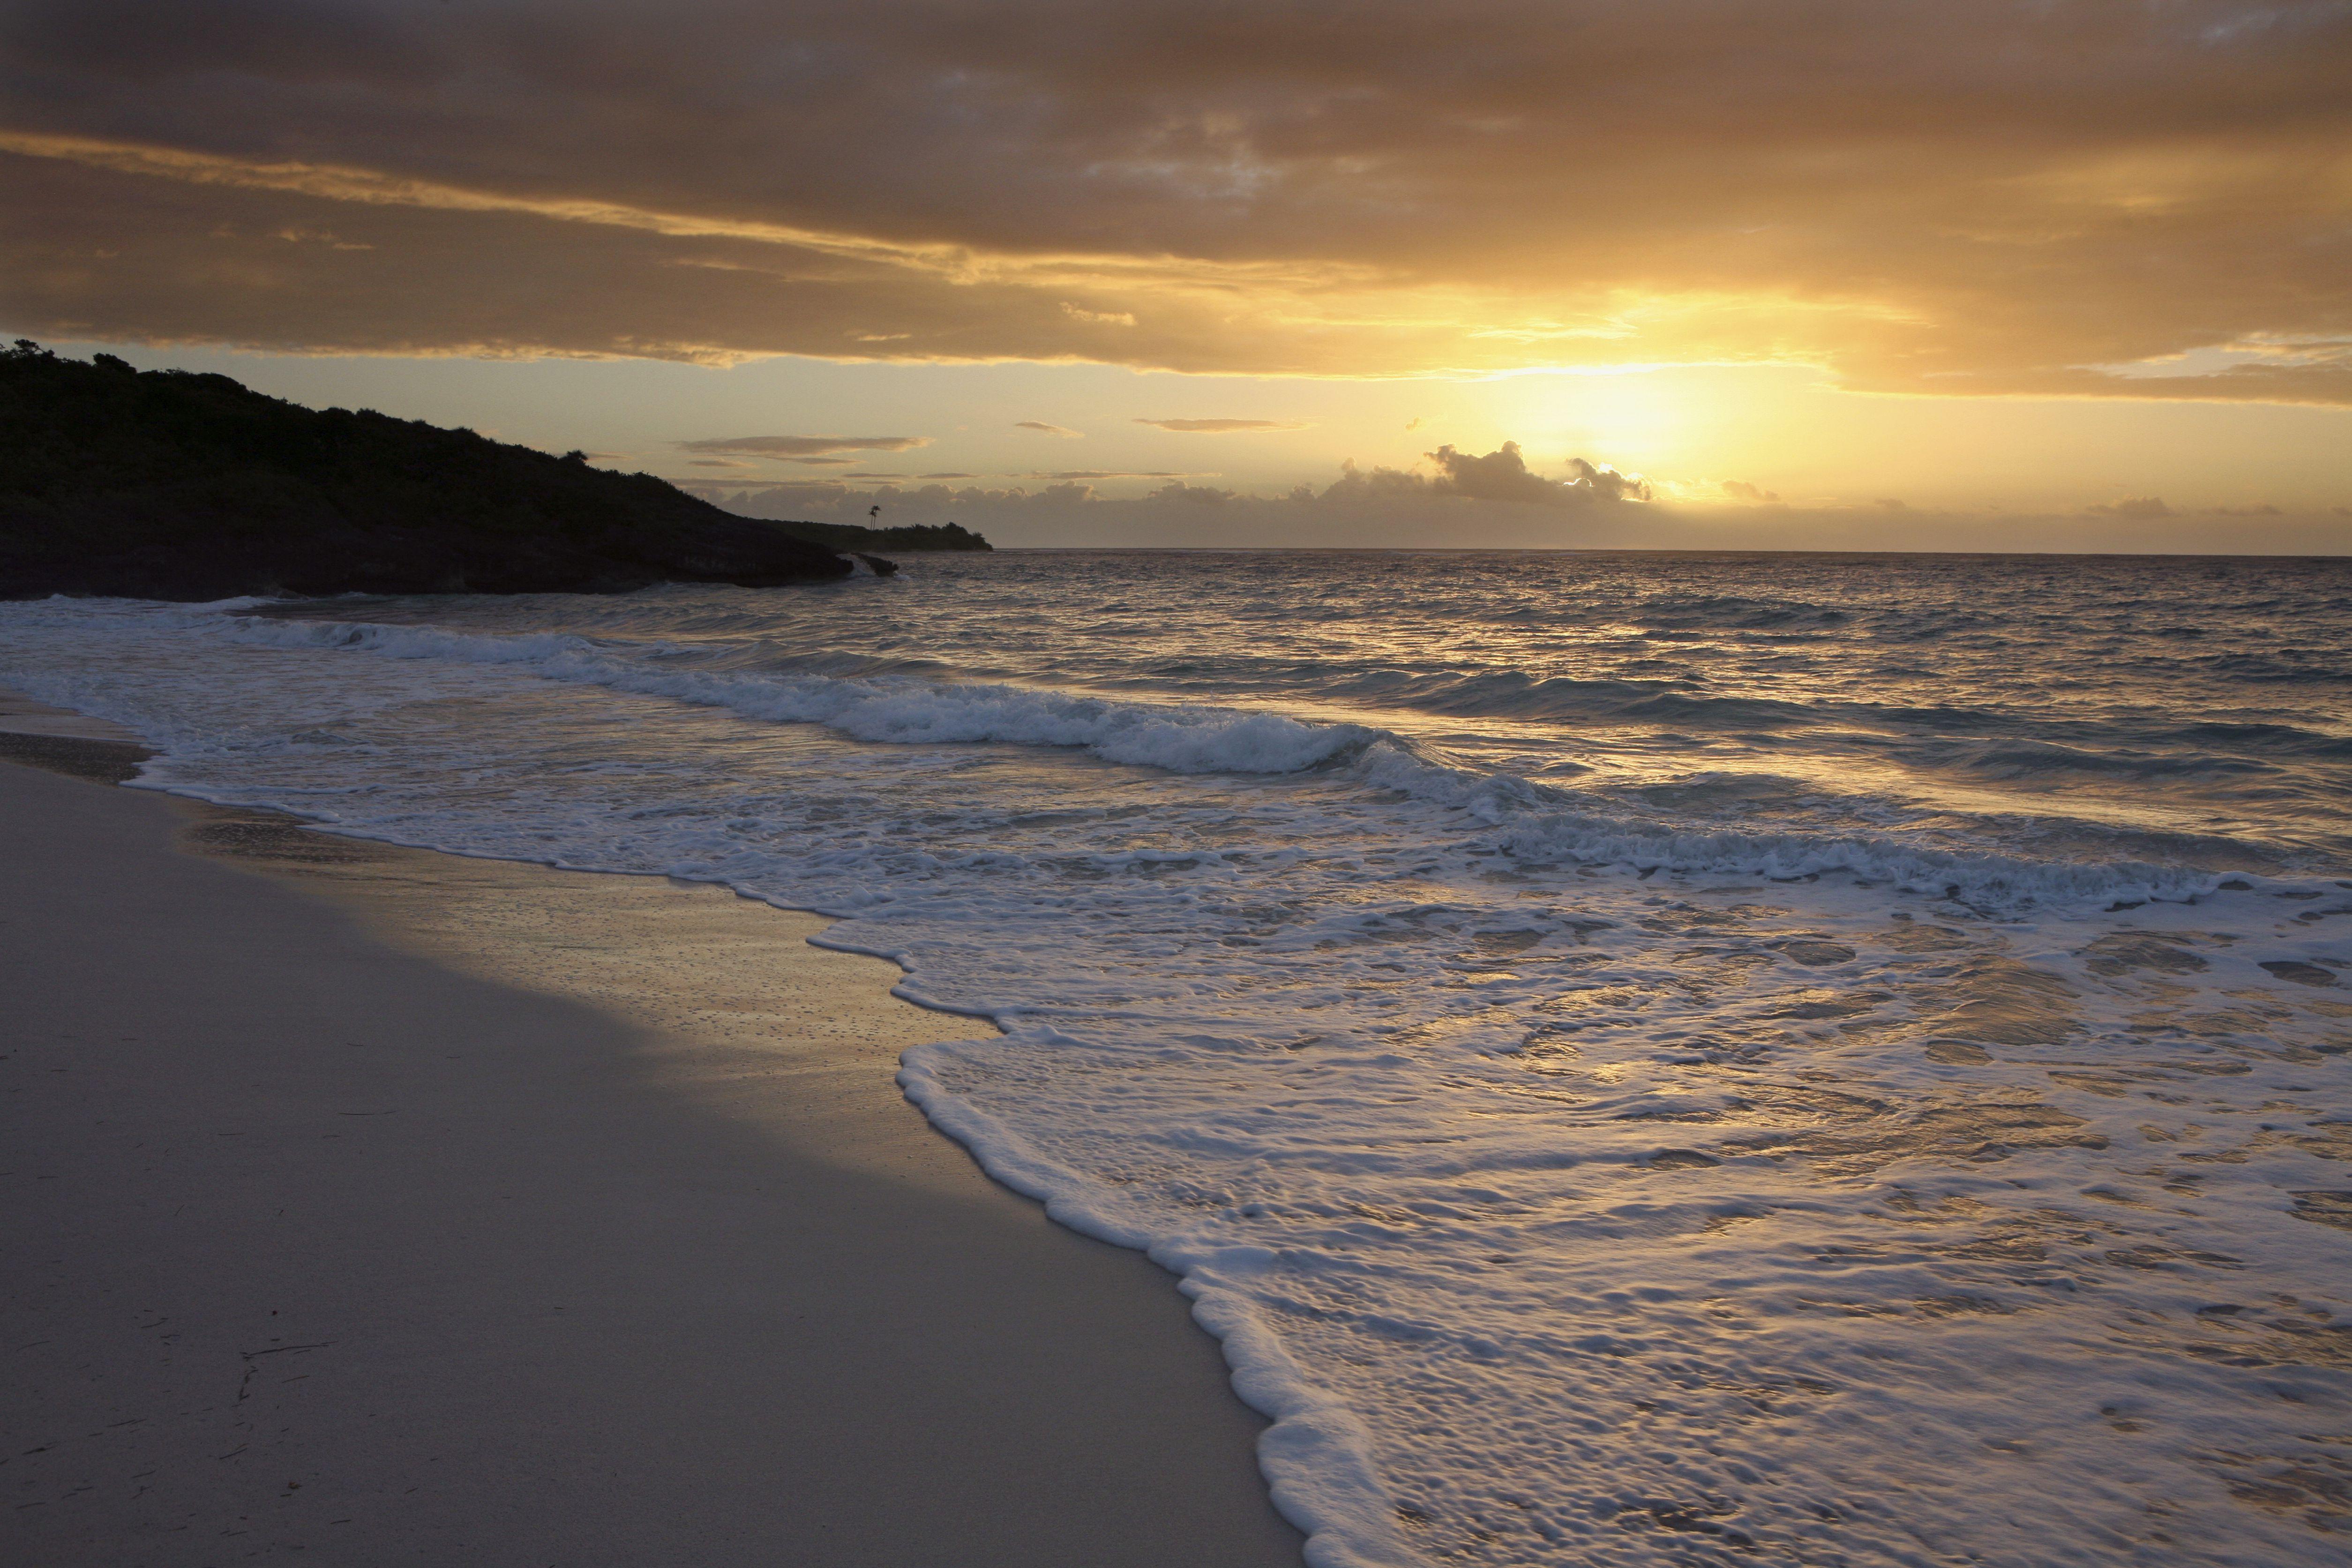 Puerto Rico, Isla de Vieques (Vieques Island), Navio Beach